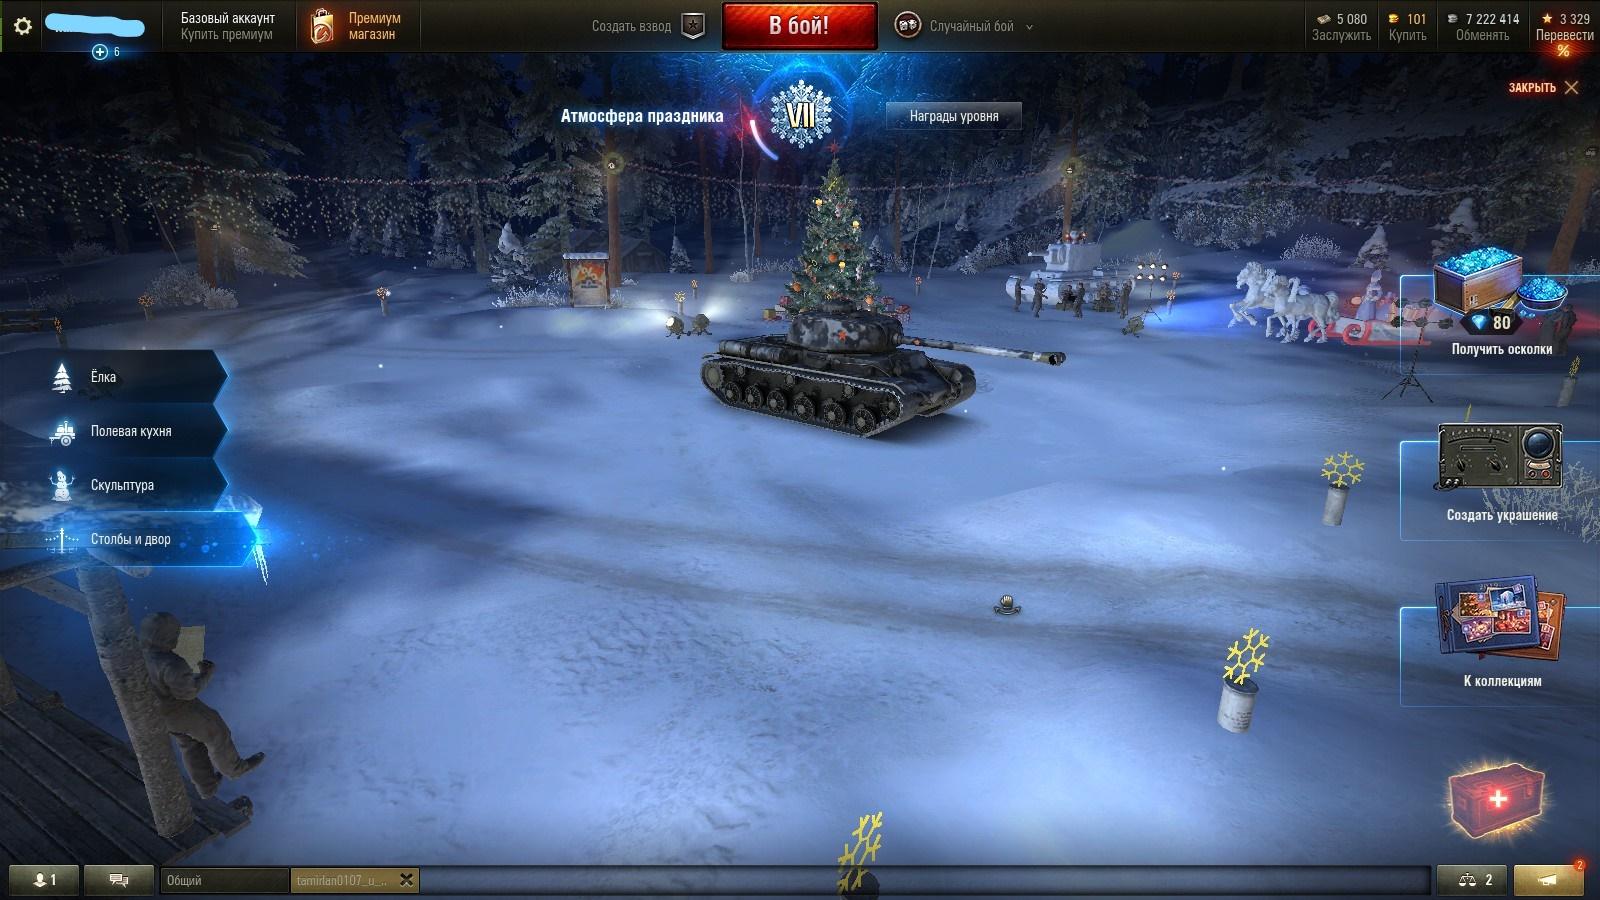 World of Tanks Screenshot 2019.01.14 - 03.07.00.79_LI.jpg - World of Tanks